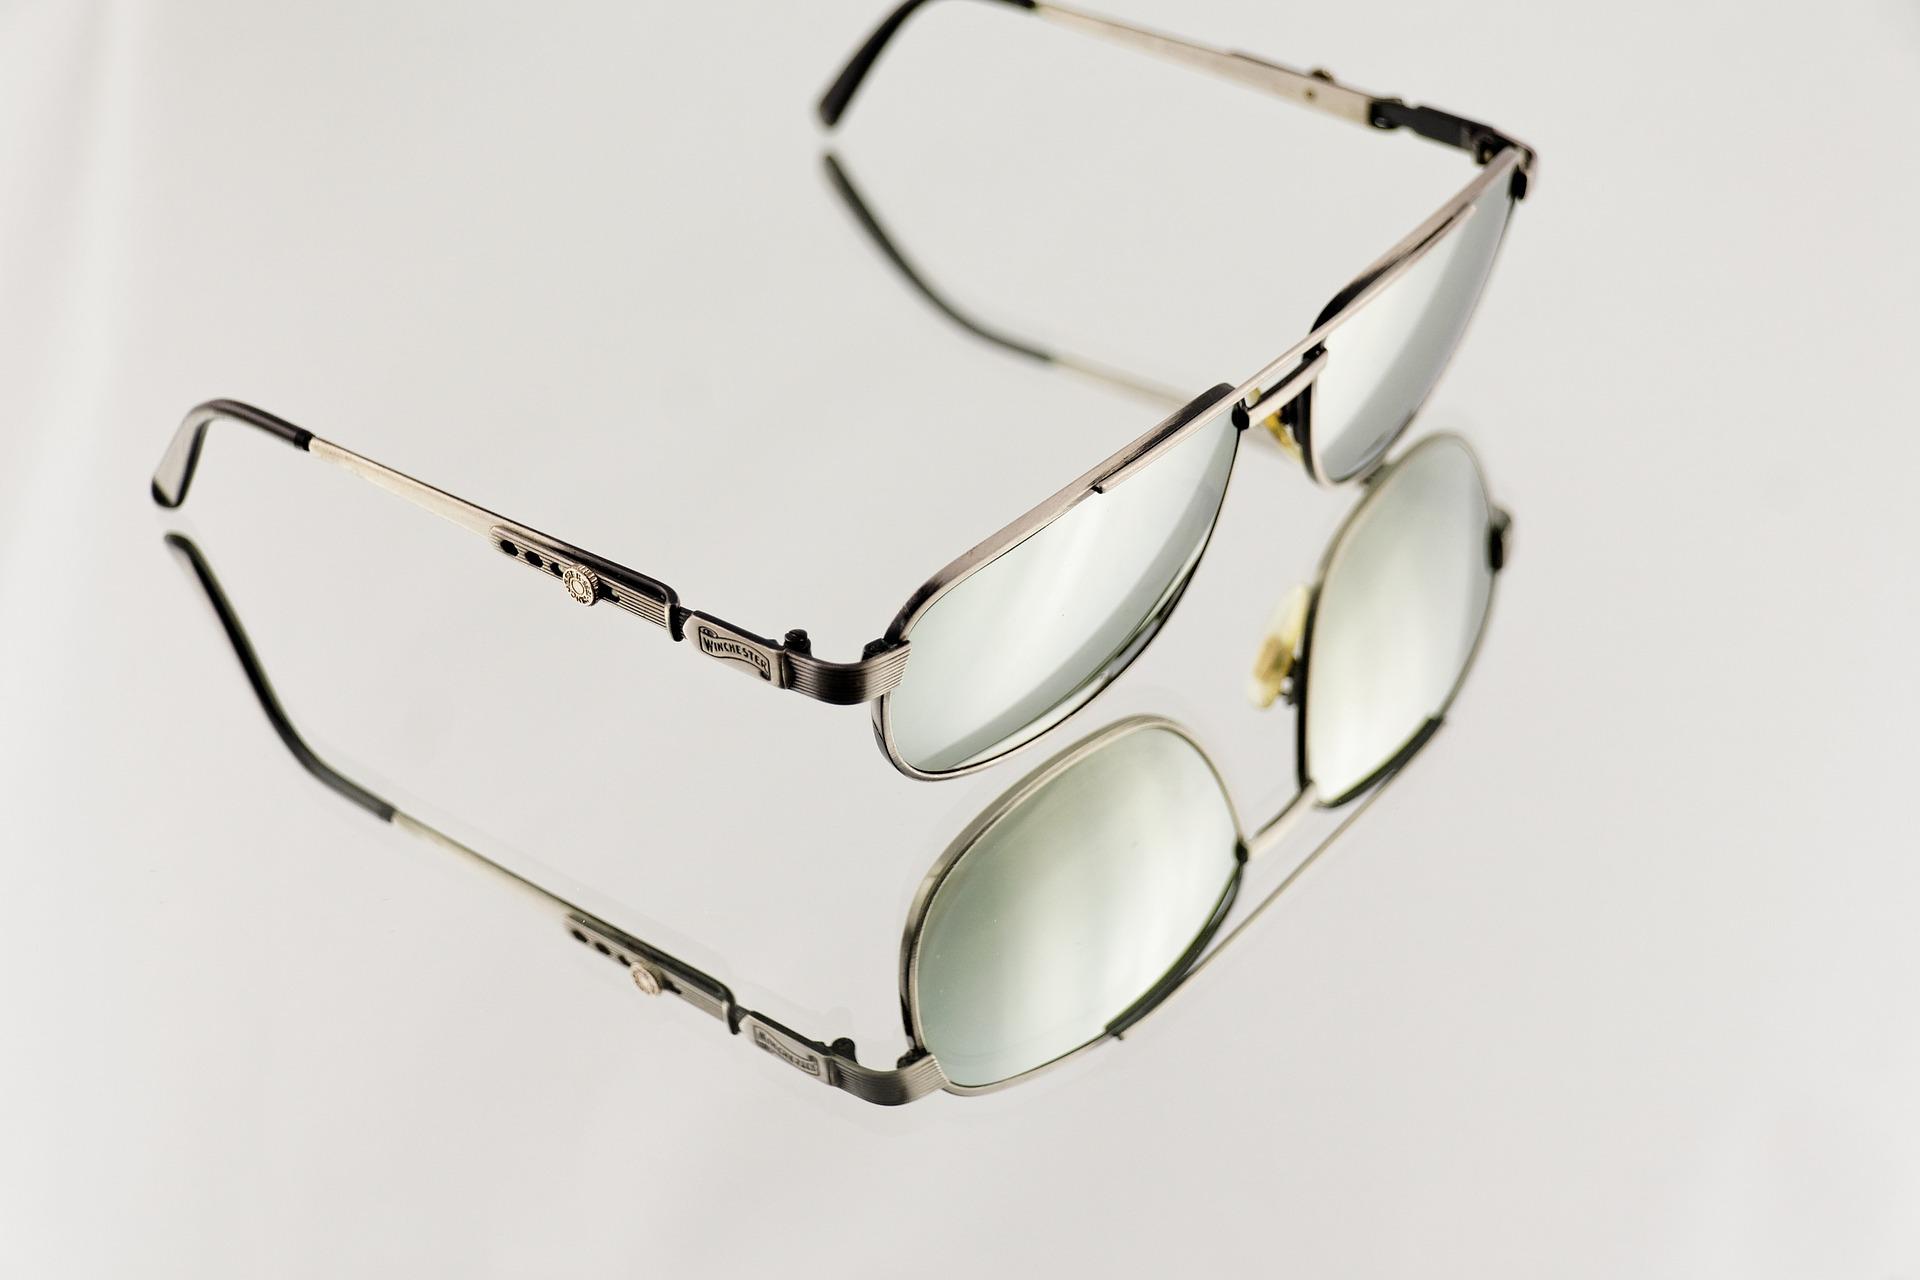 sunglasses-865809_1920